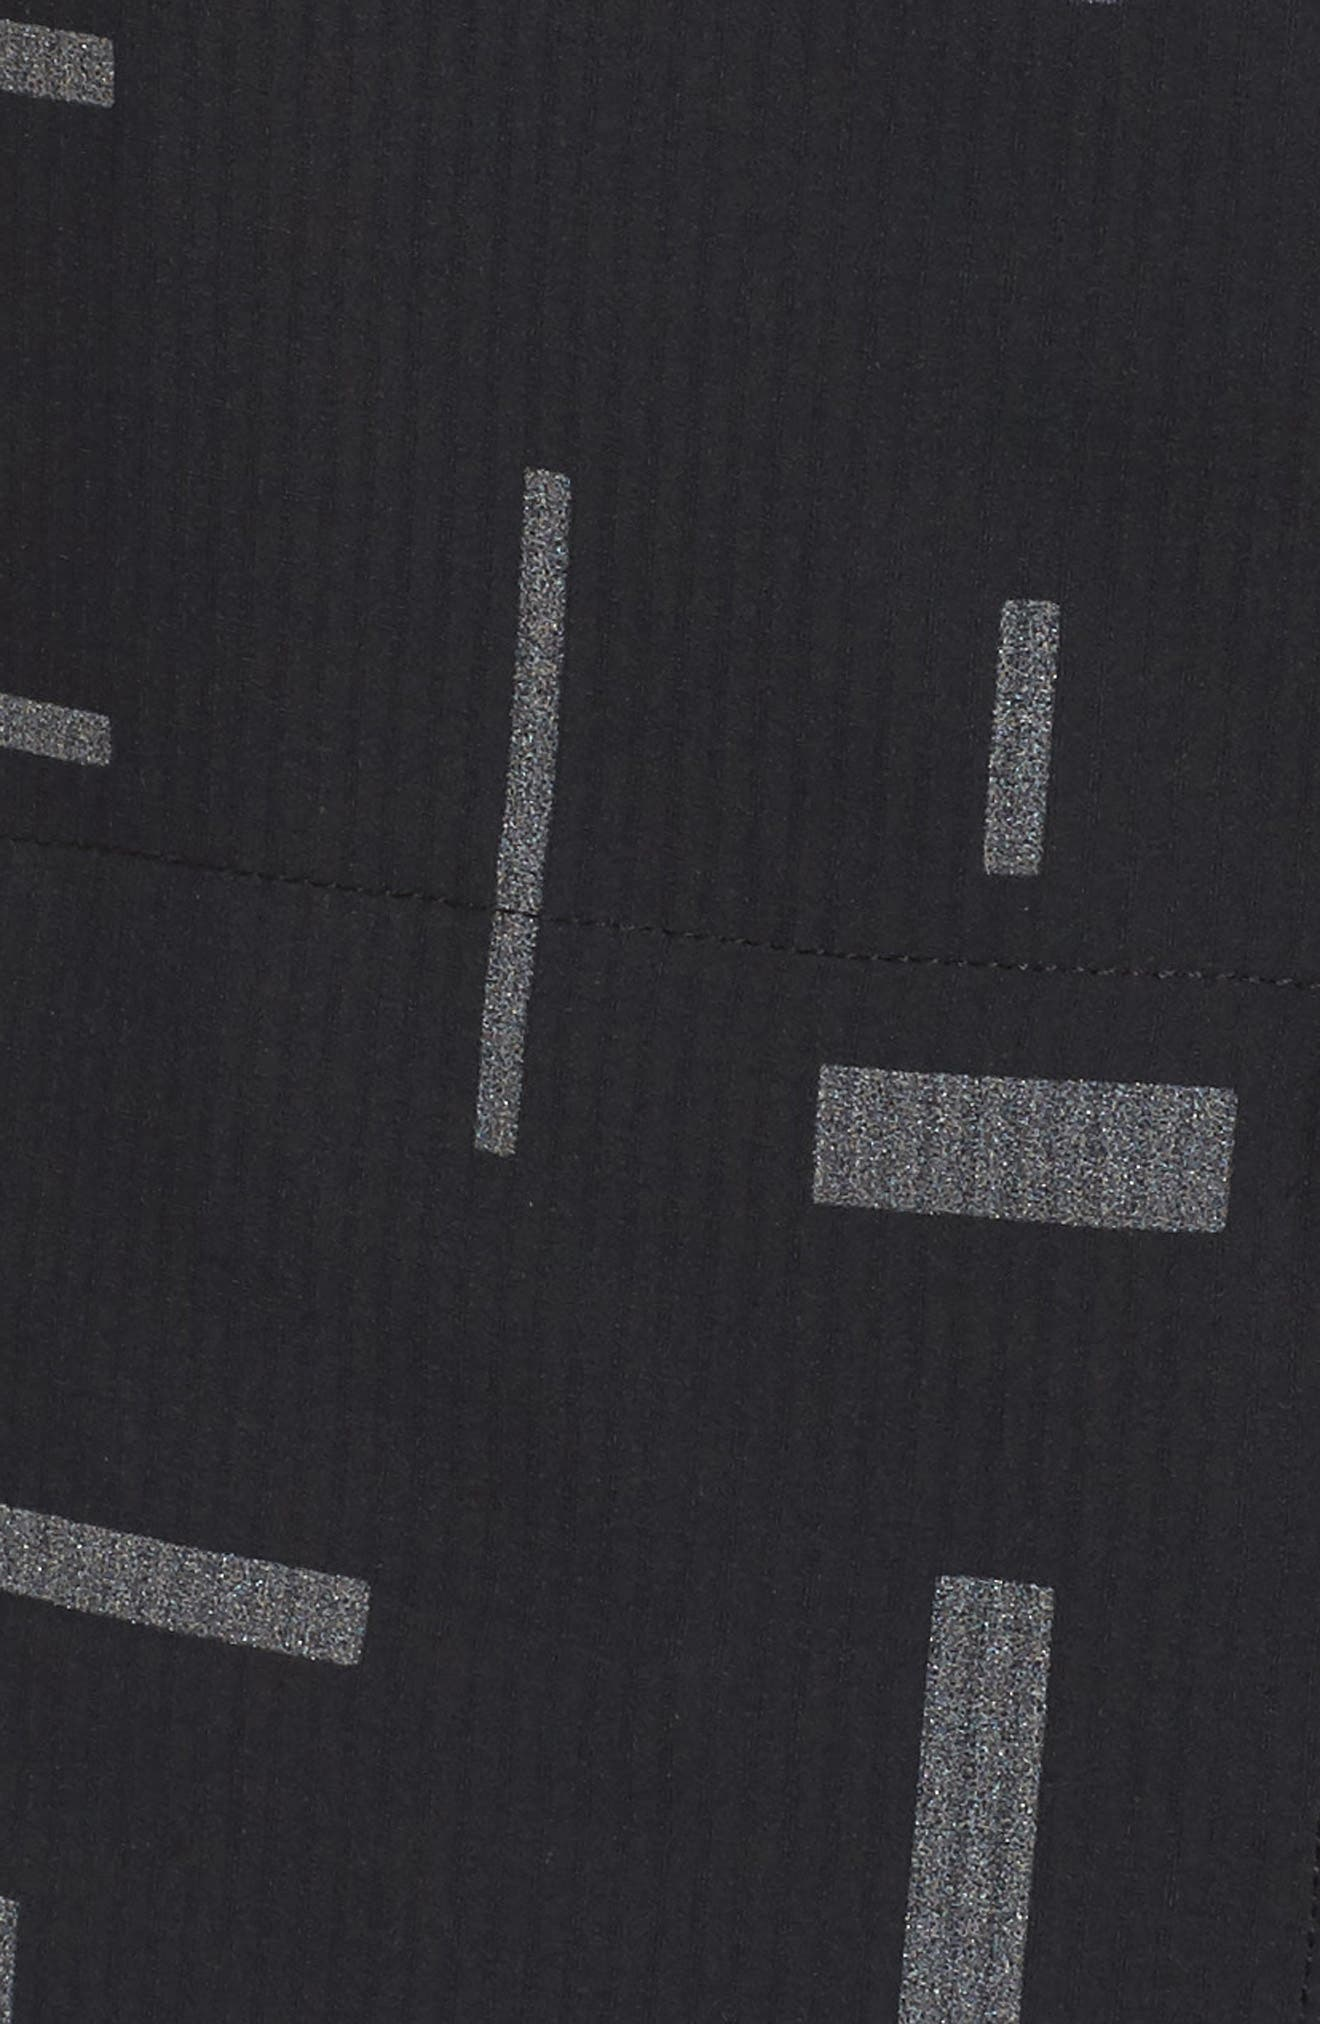 Canopy SE Reflective Running Jacket,                             Alternate thumbnail 7, color,                             001